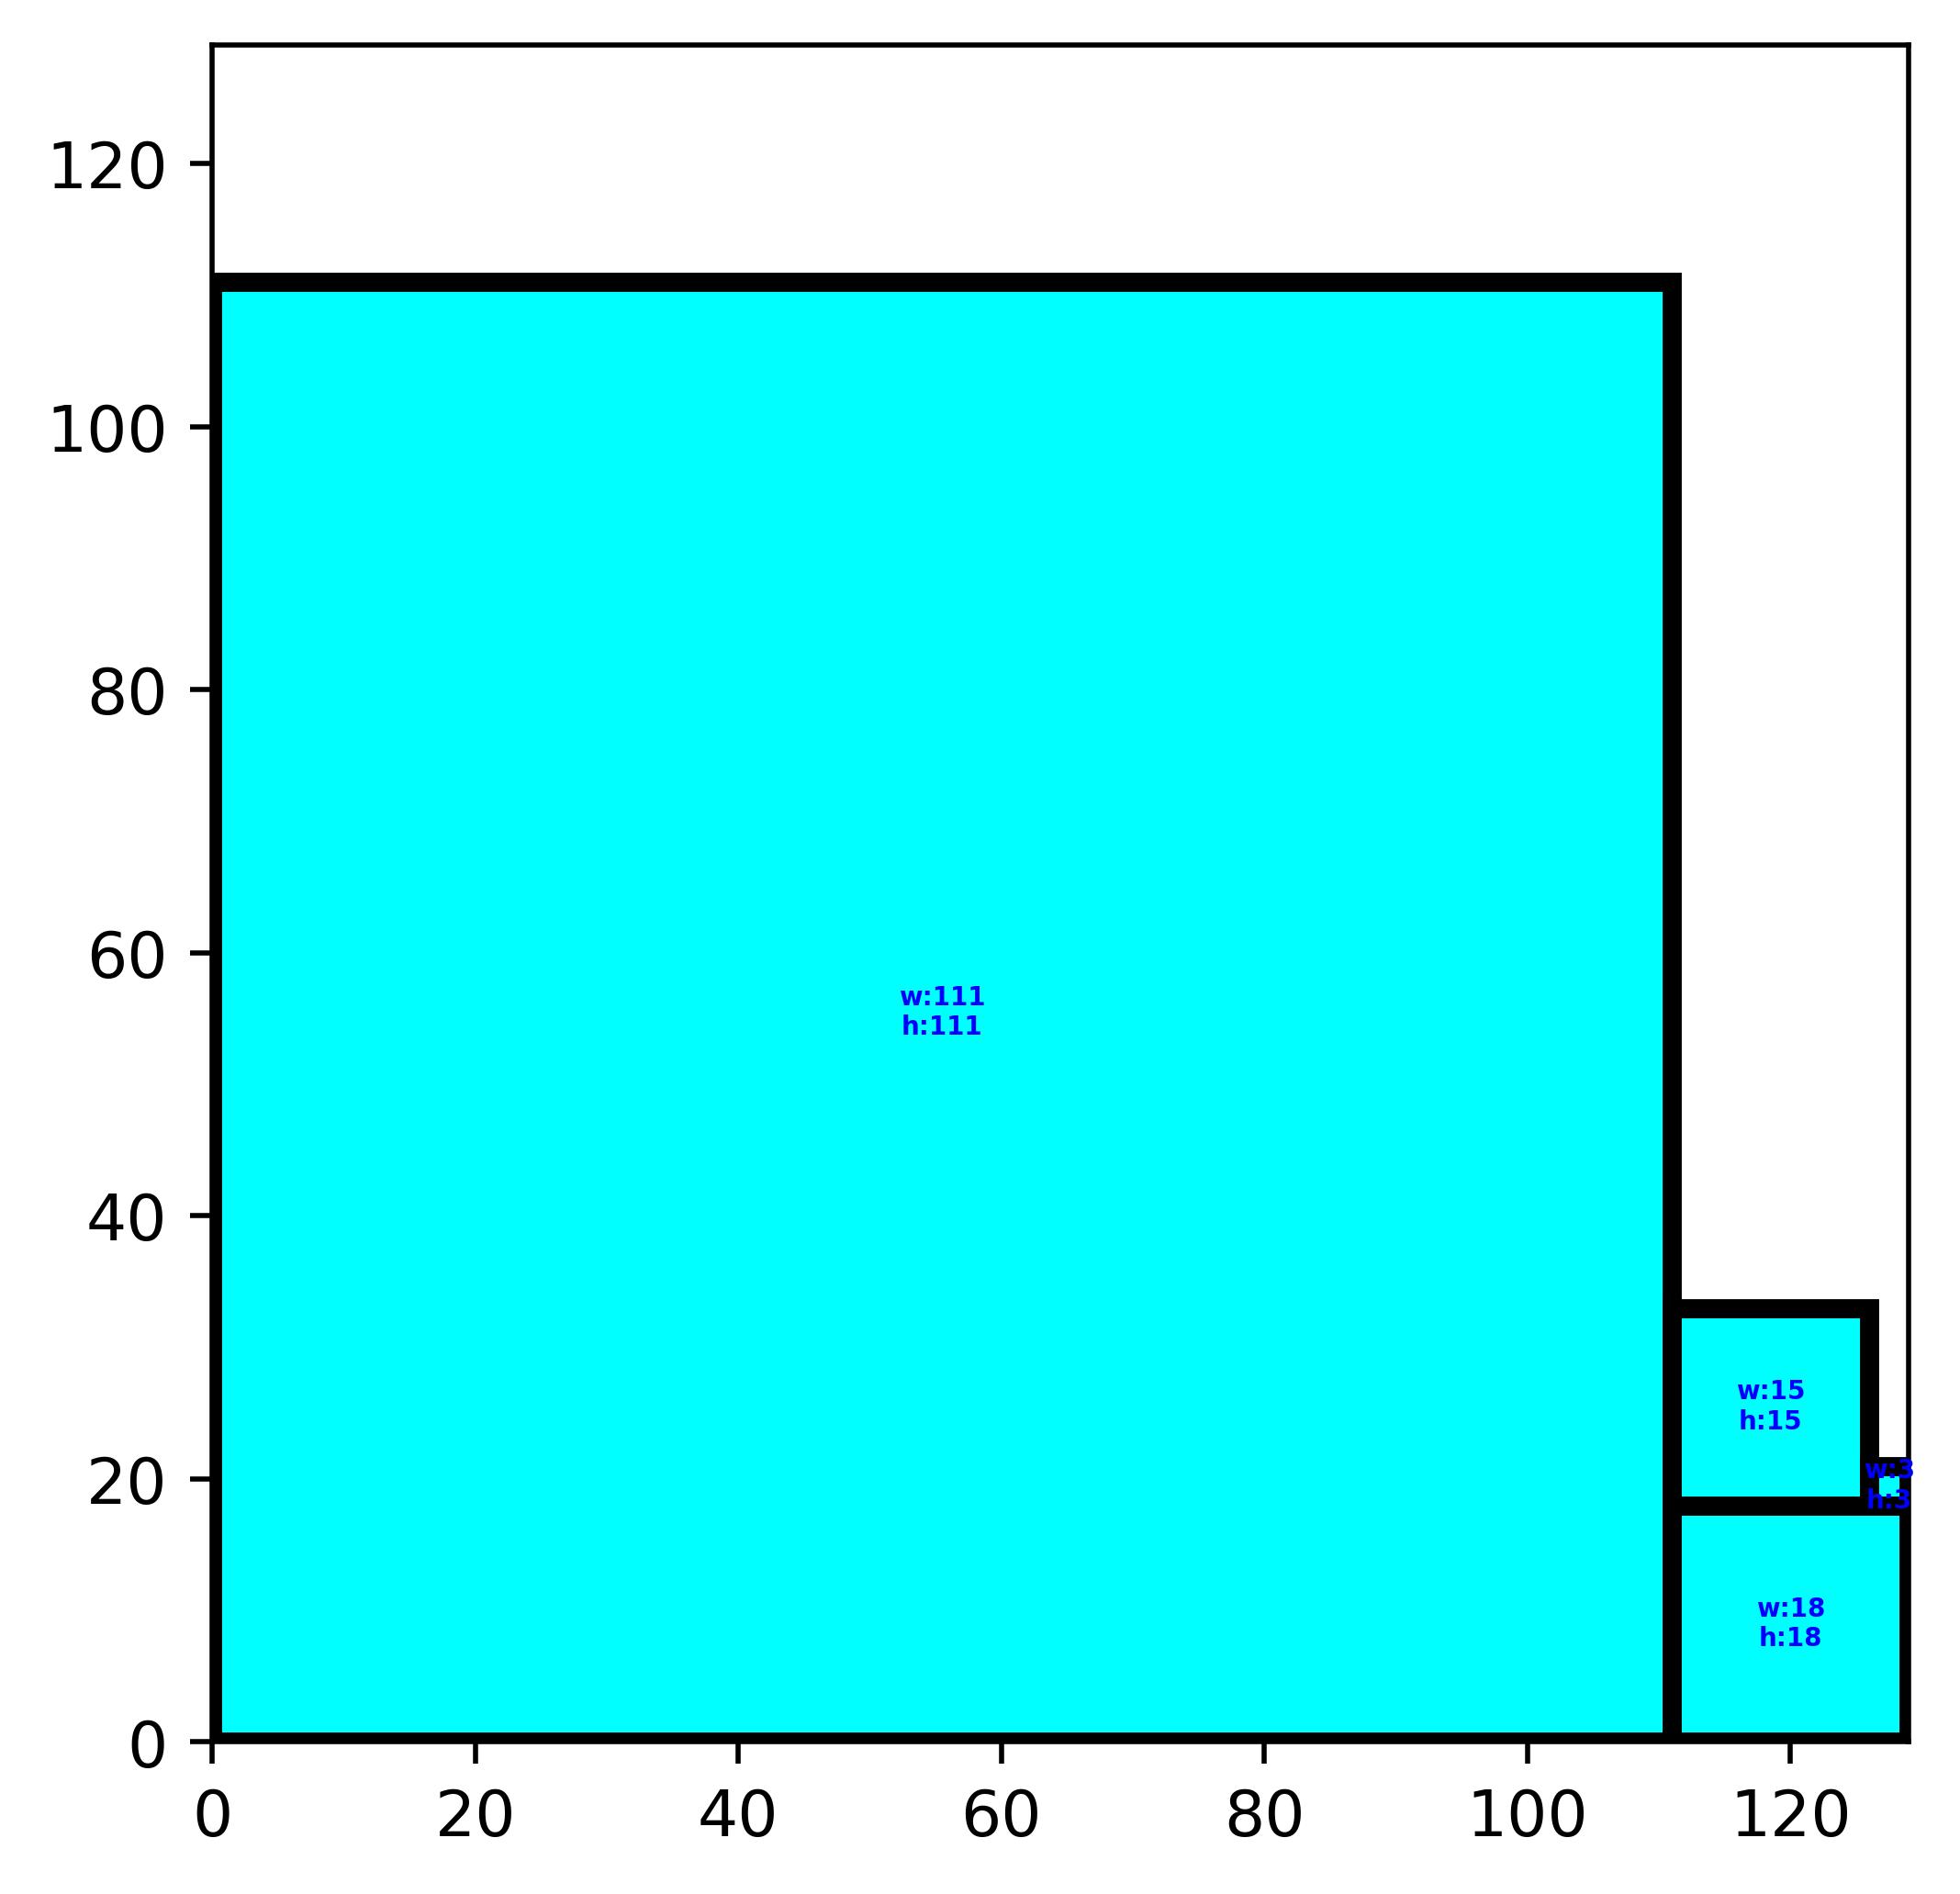 optimization_algo/packing_screenshots/AlphaGoZero/pack_size_129/penalty_constant_0/k=4_max=17280_latency=74814.png